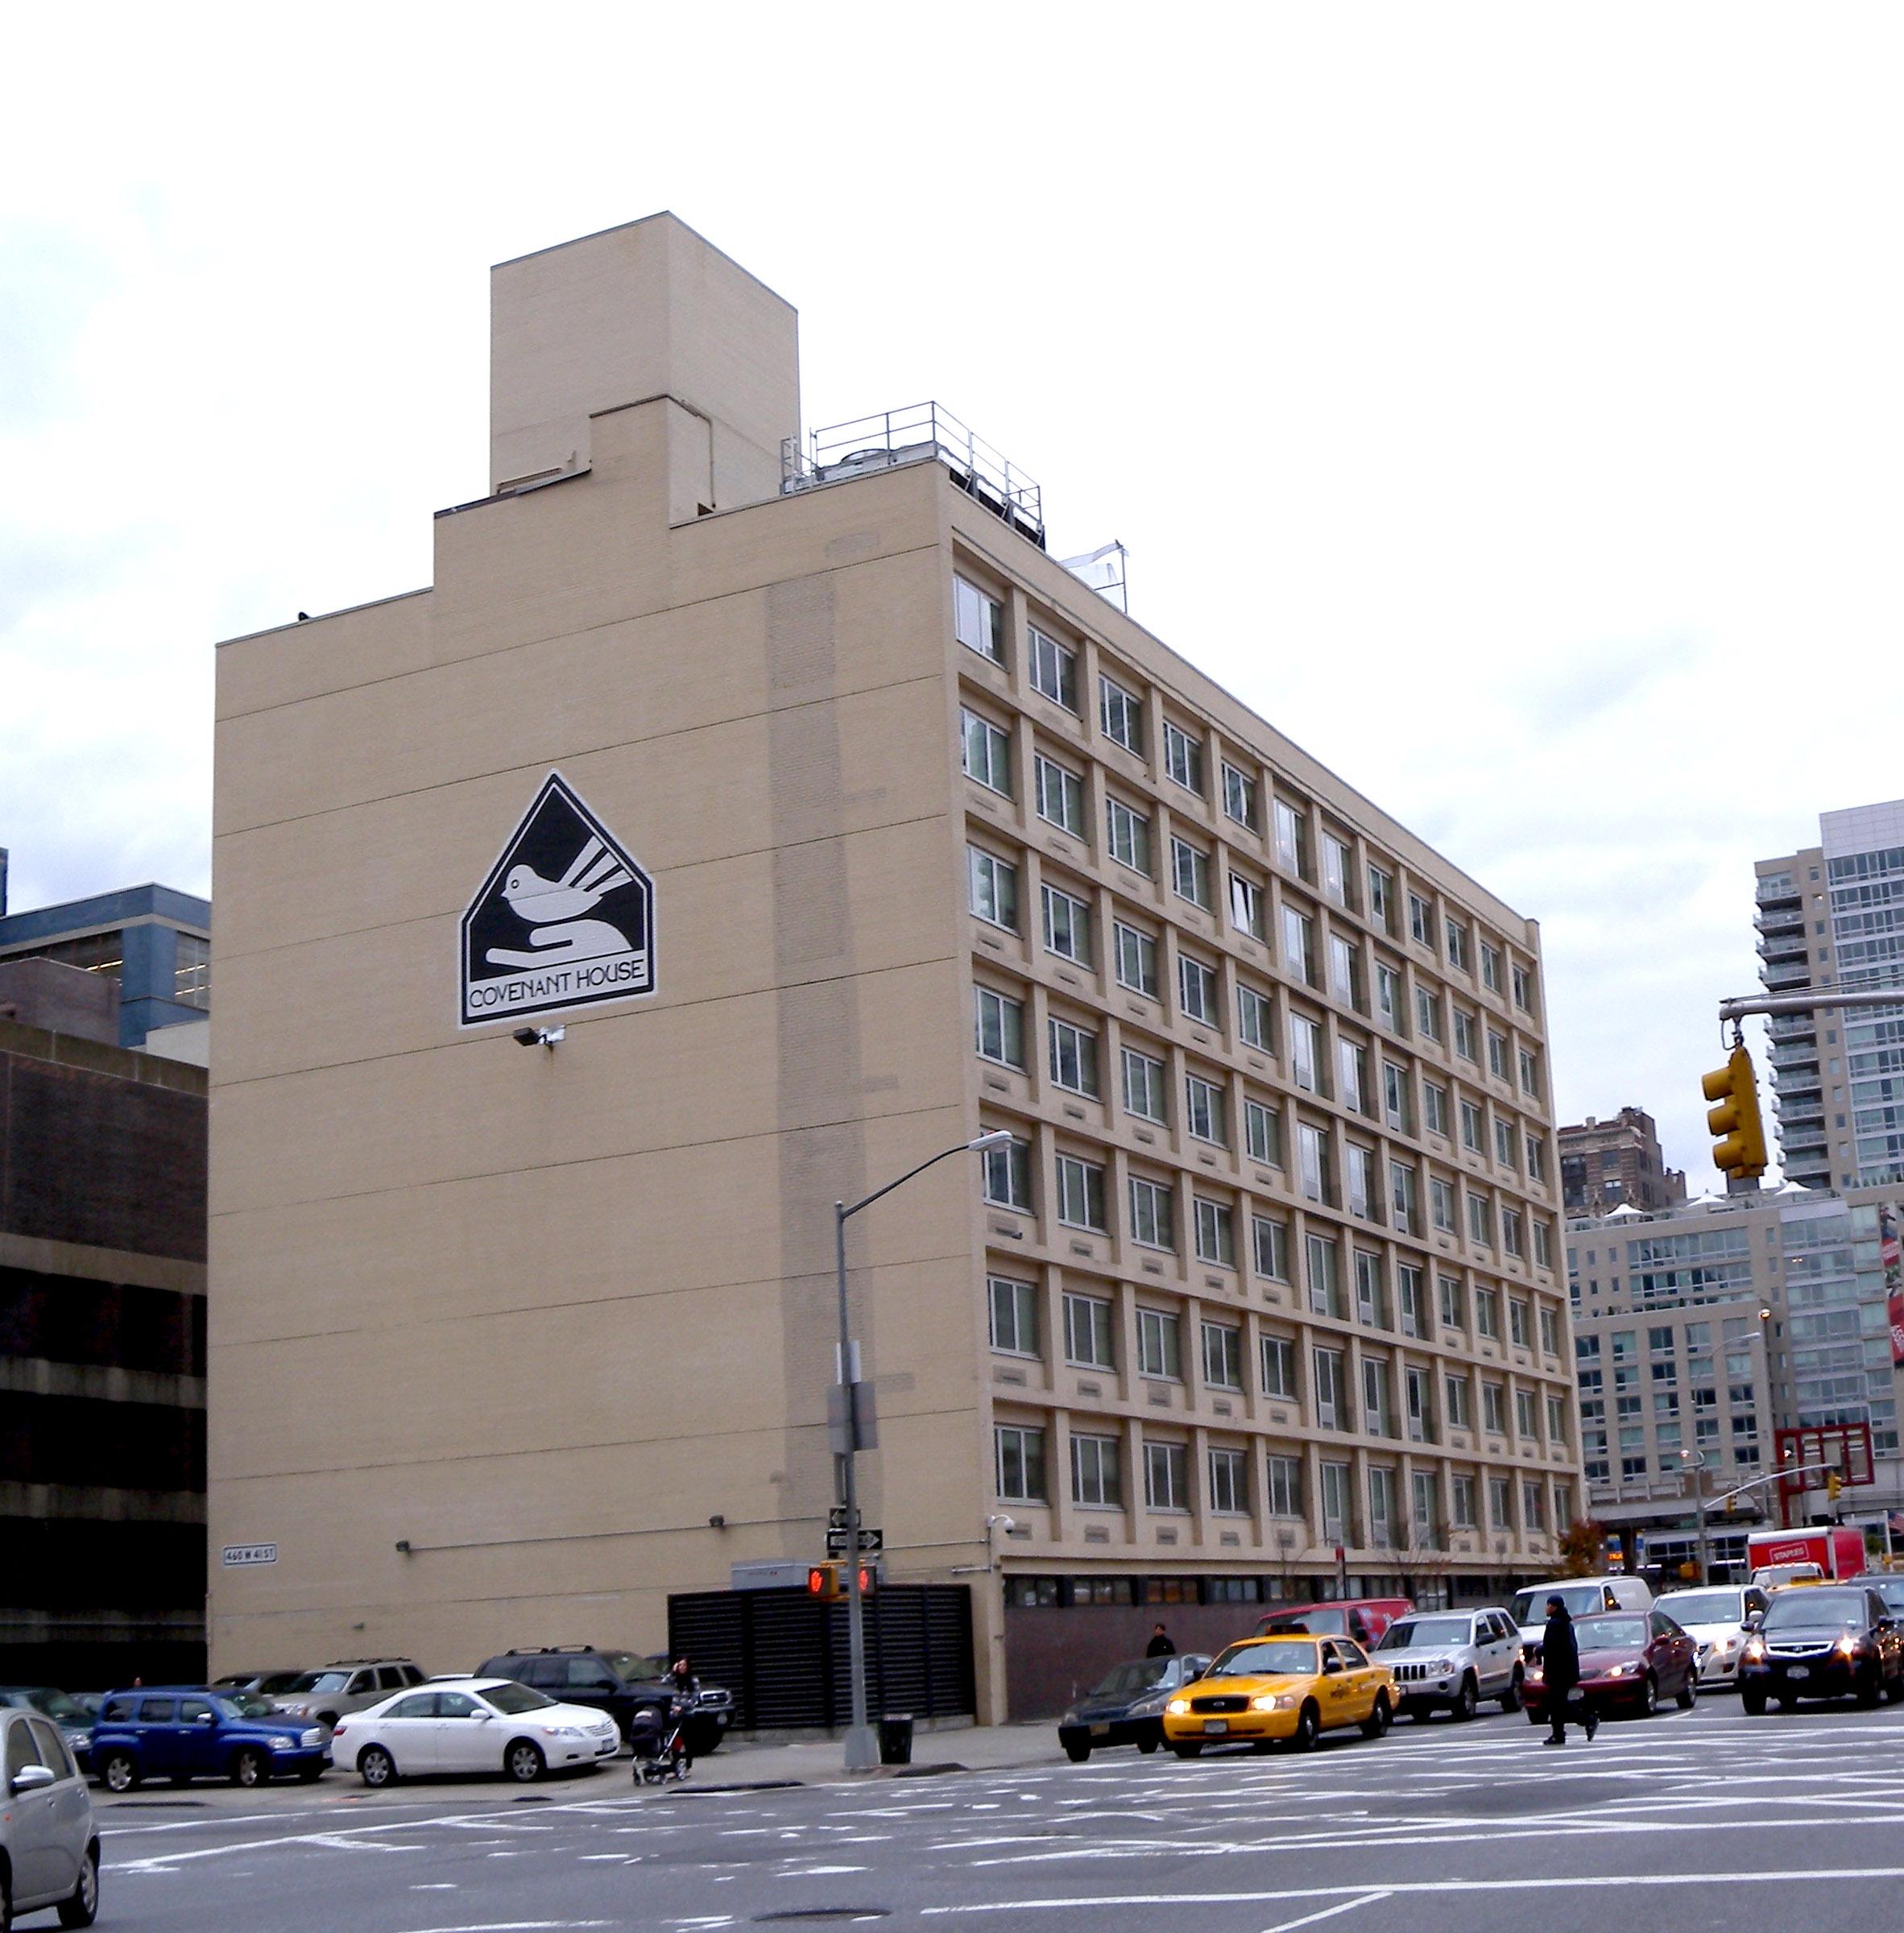 Covenant House Toronto Logo History[edit